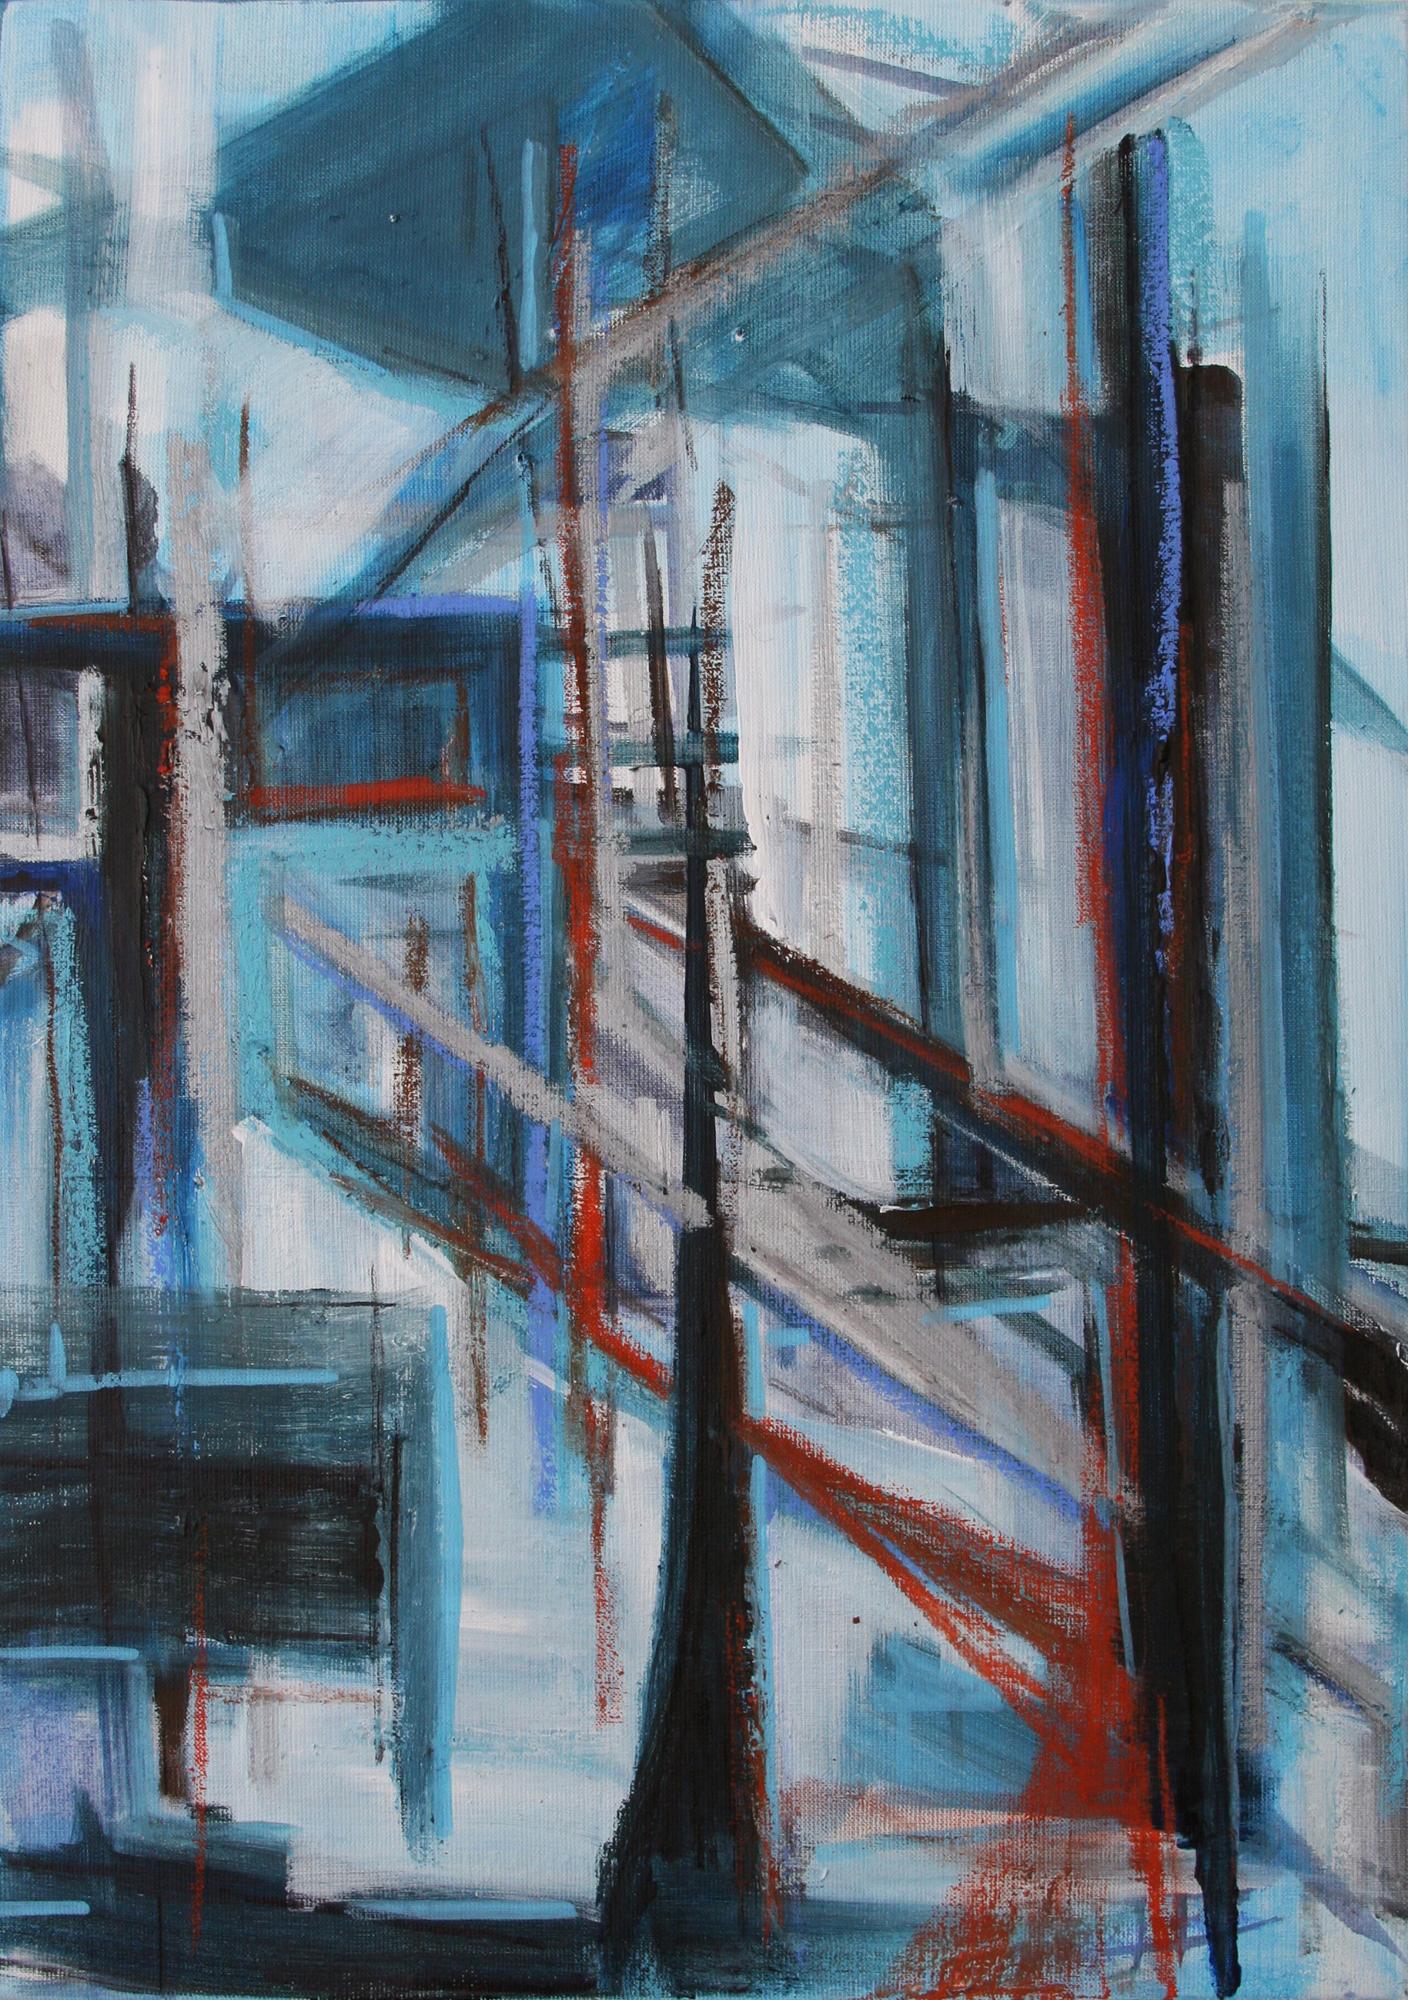 Ruim, 60 x 40 cm, 2015, acryl en olie op doek, Daniëlle Davidson